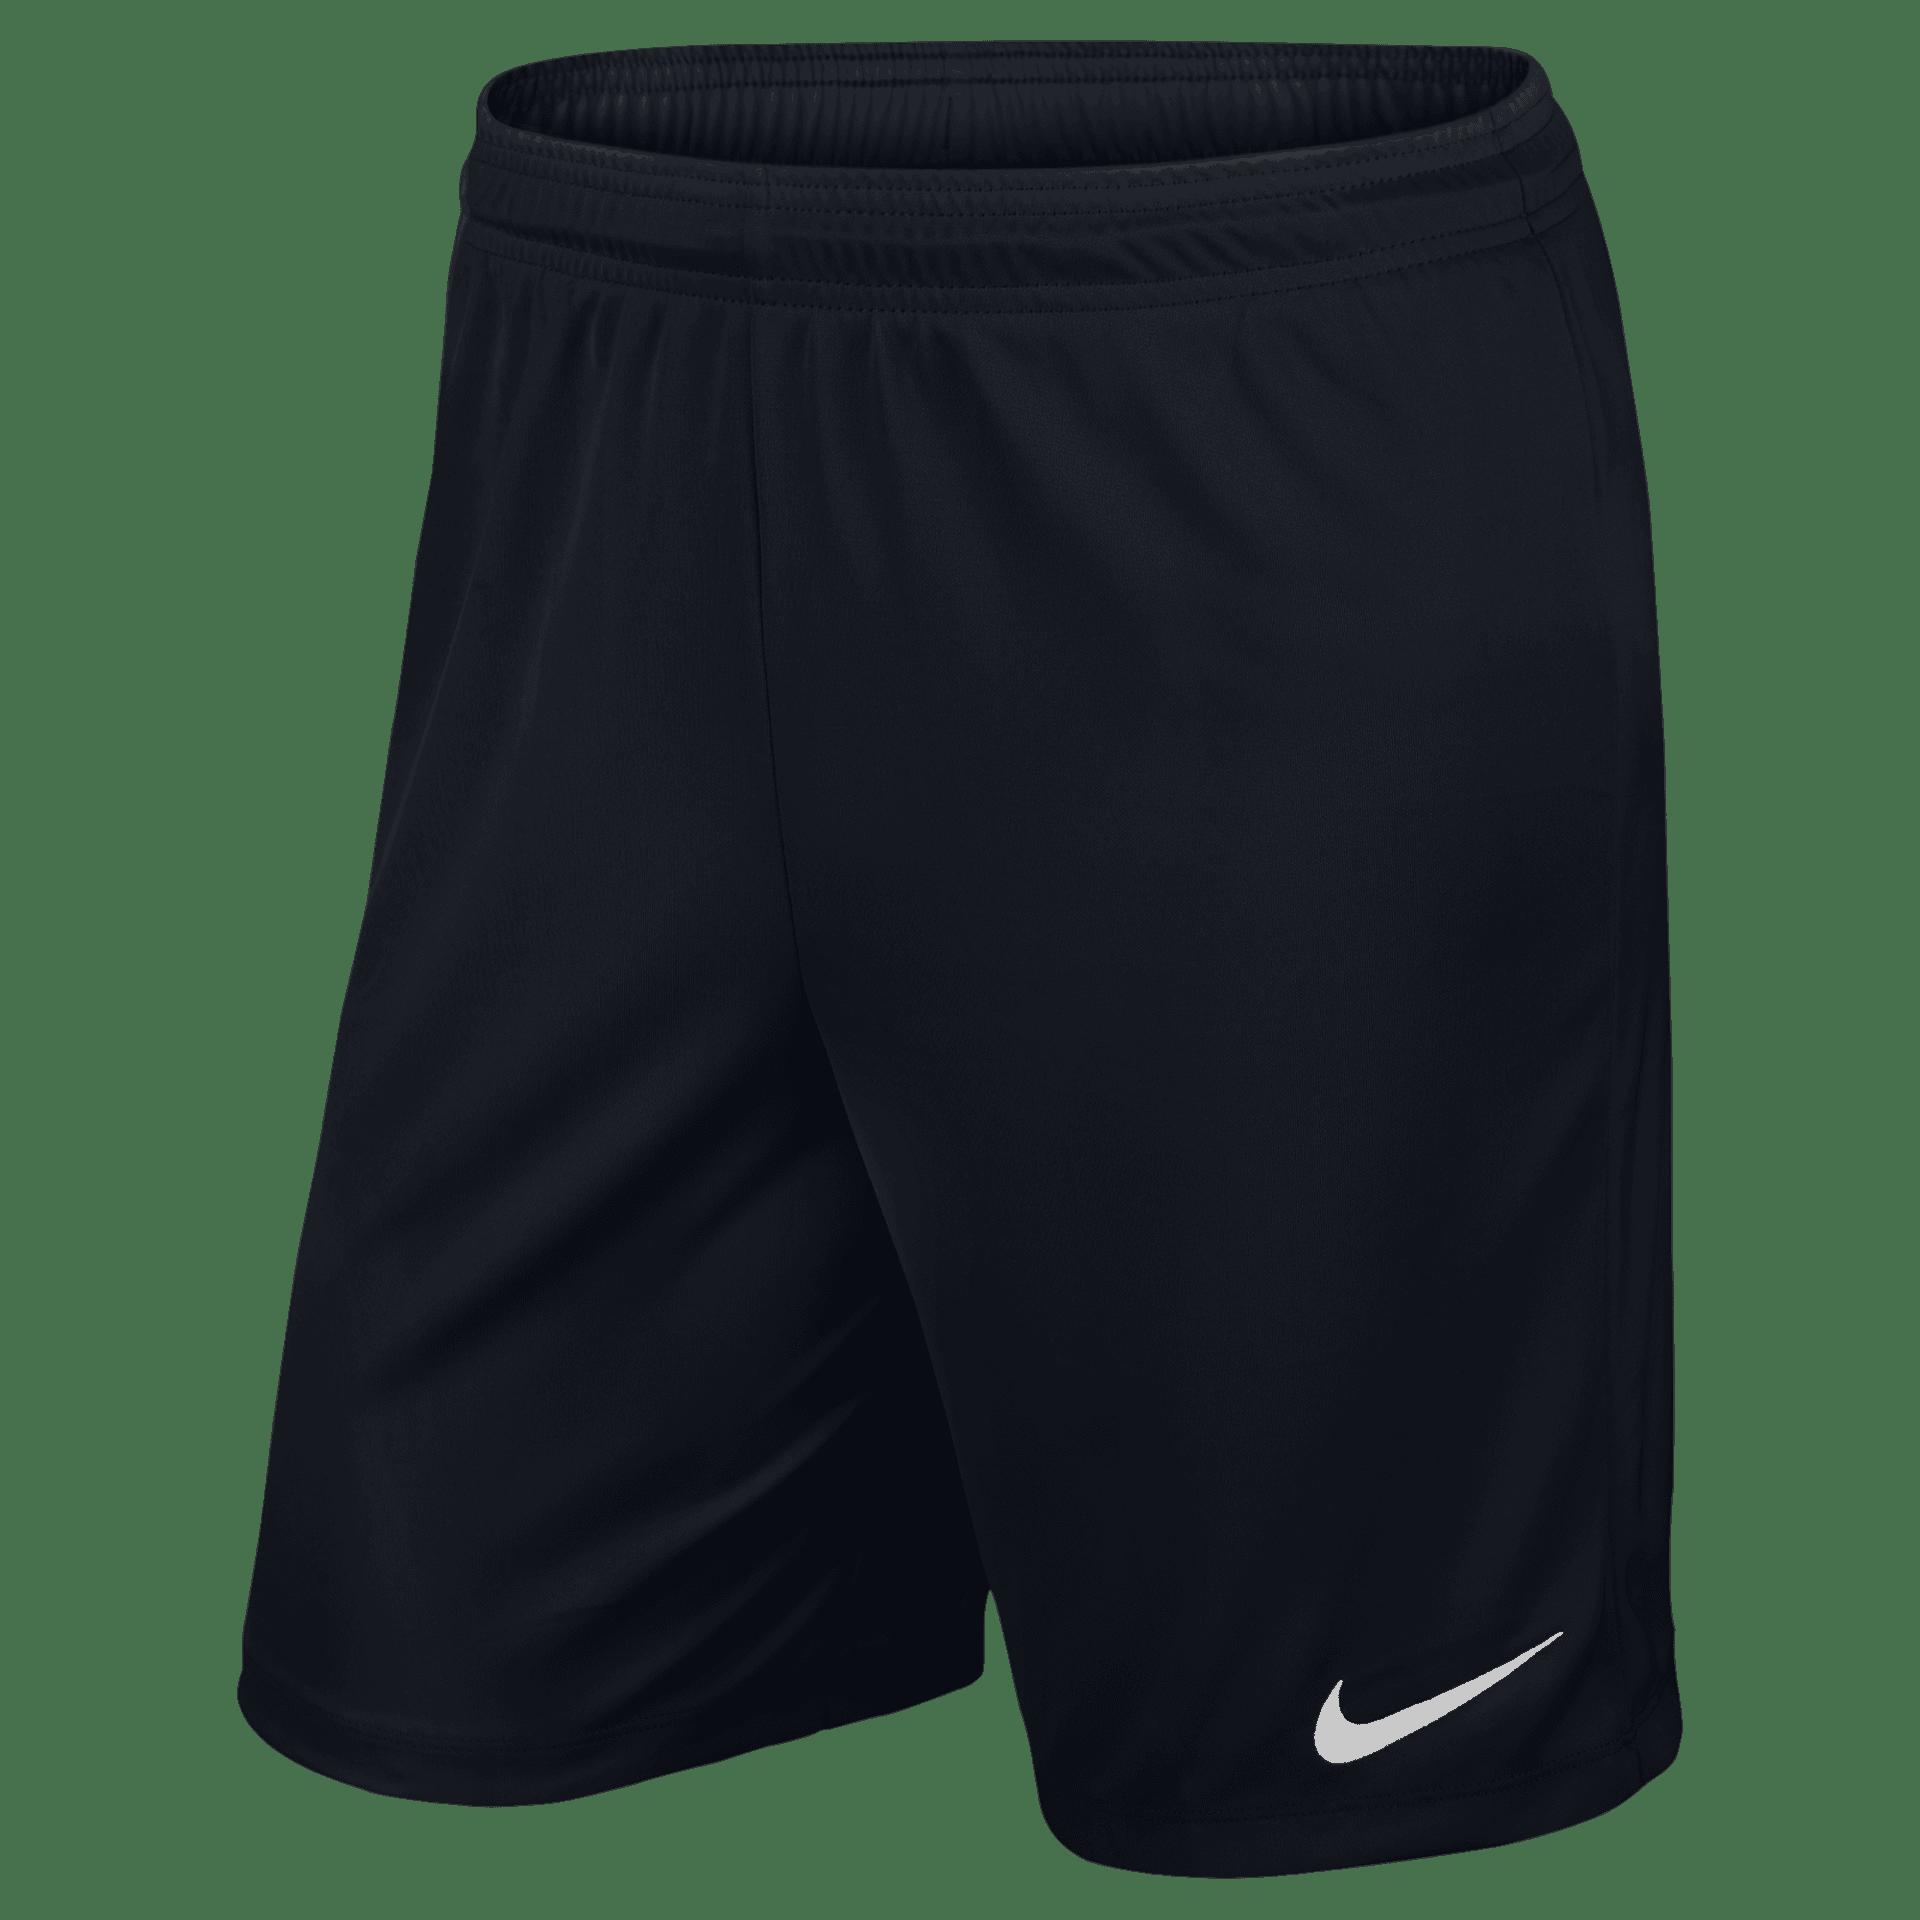 fivemiletown utd shorts 34366 p